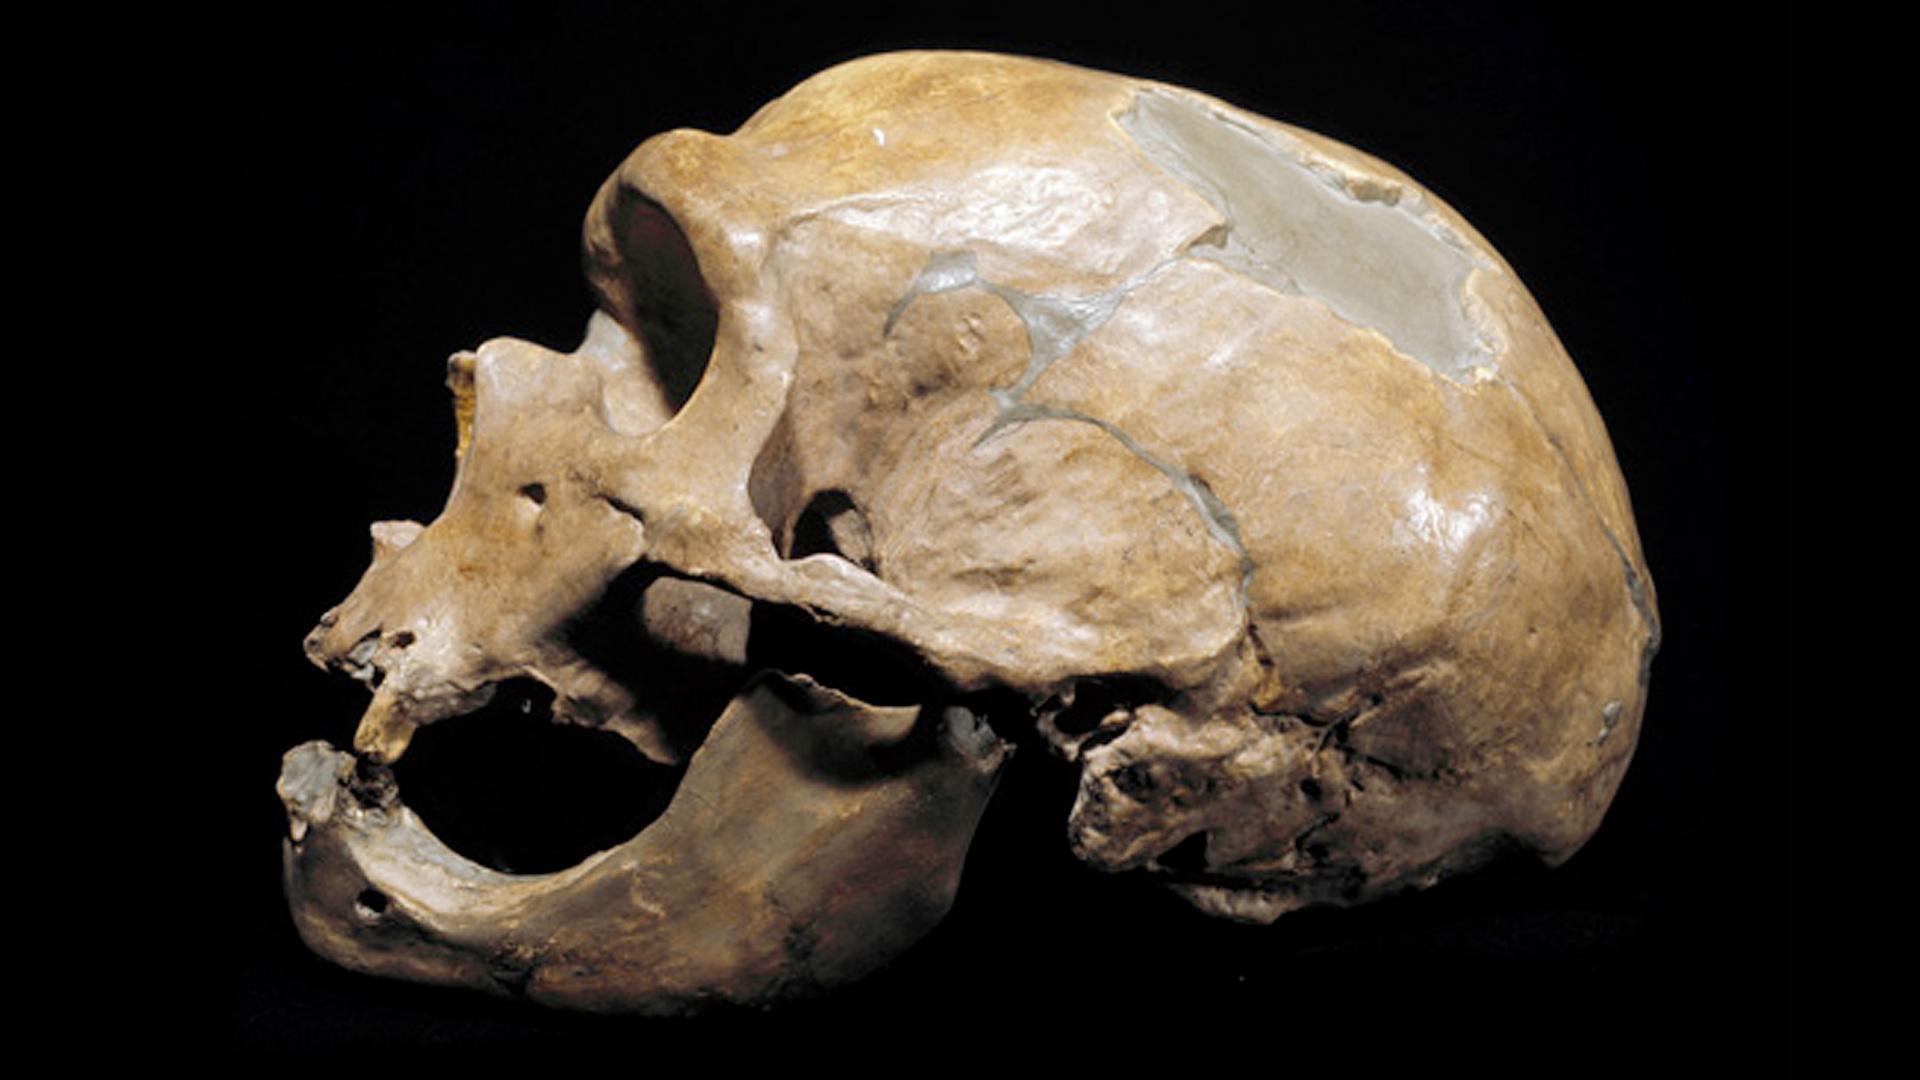 Skeleton Head Wallpaper 3d Nova Official Website Are Neanderthals Human